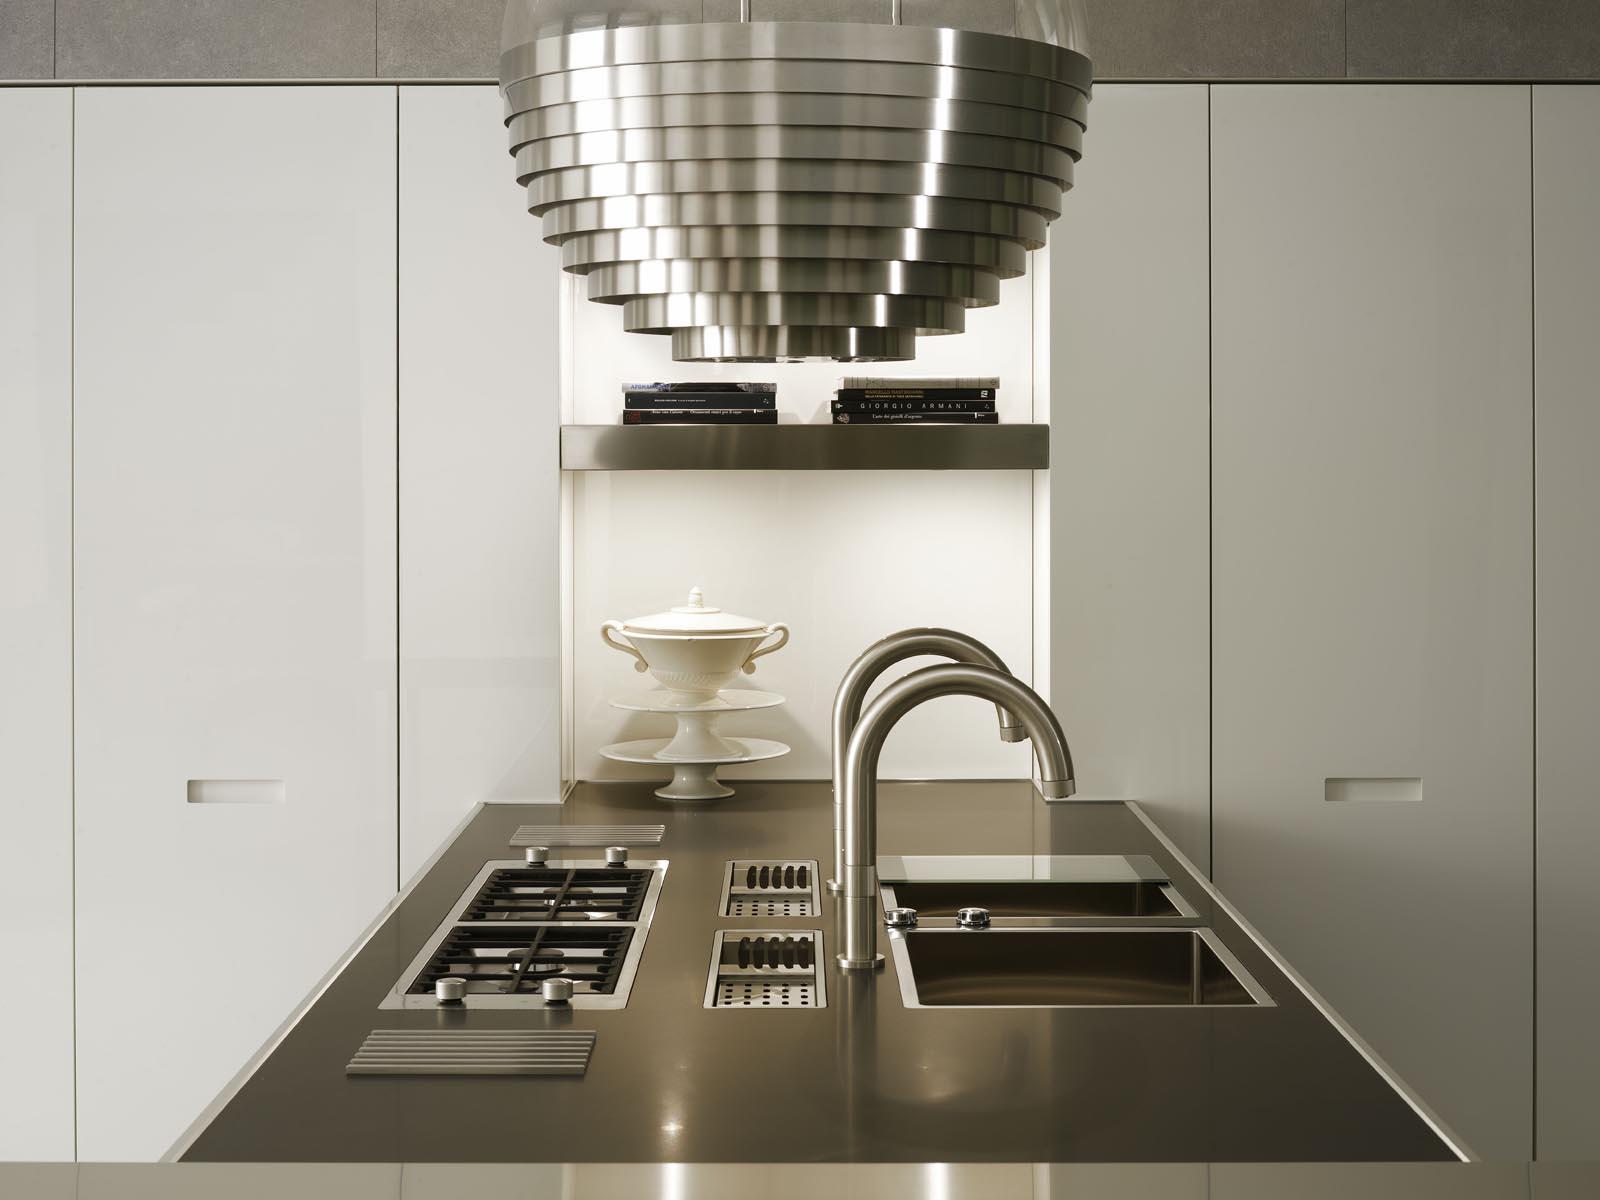 Grande cuisine design cuisine avec grand ilot de fonction for Grande cuisine design